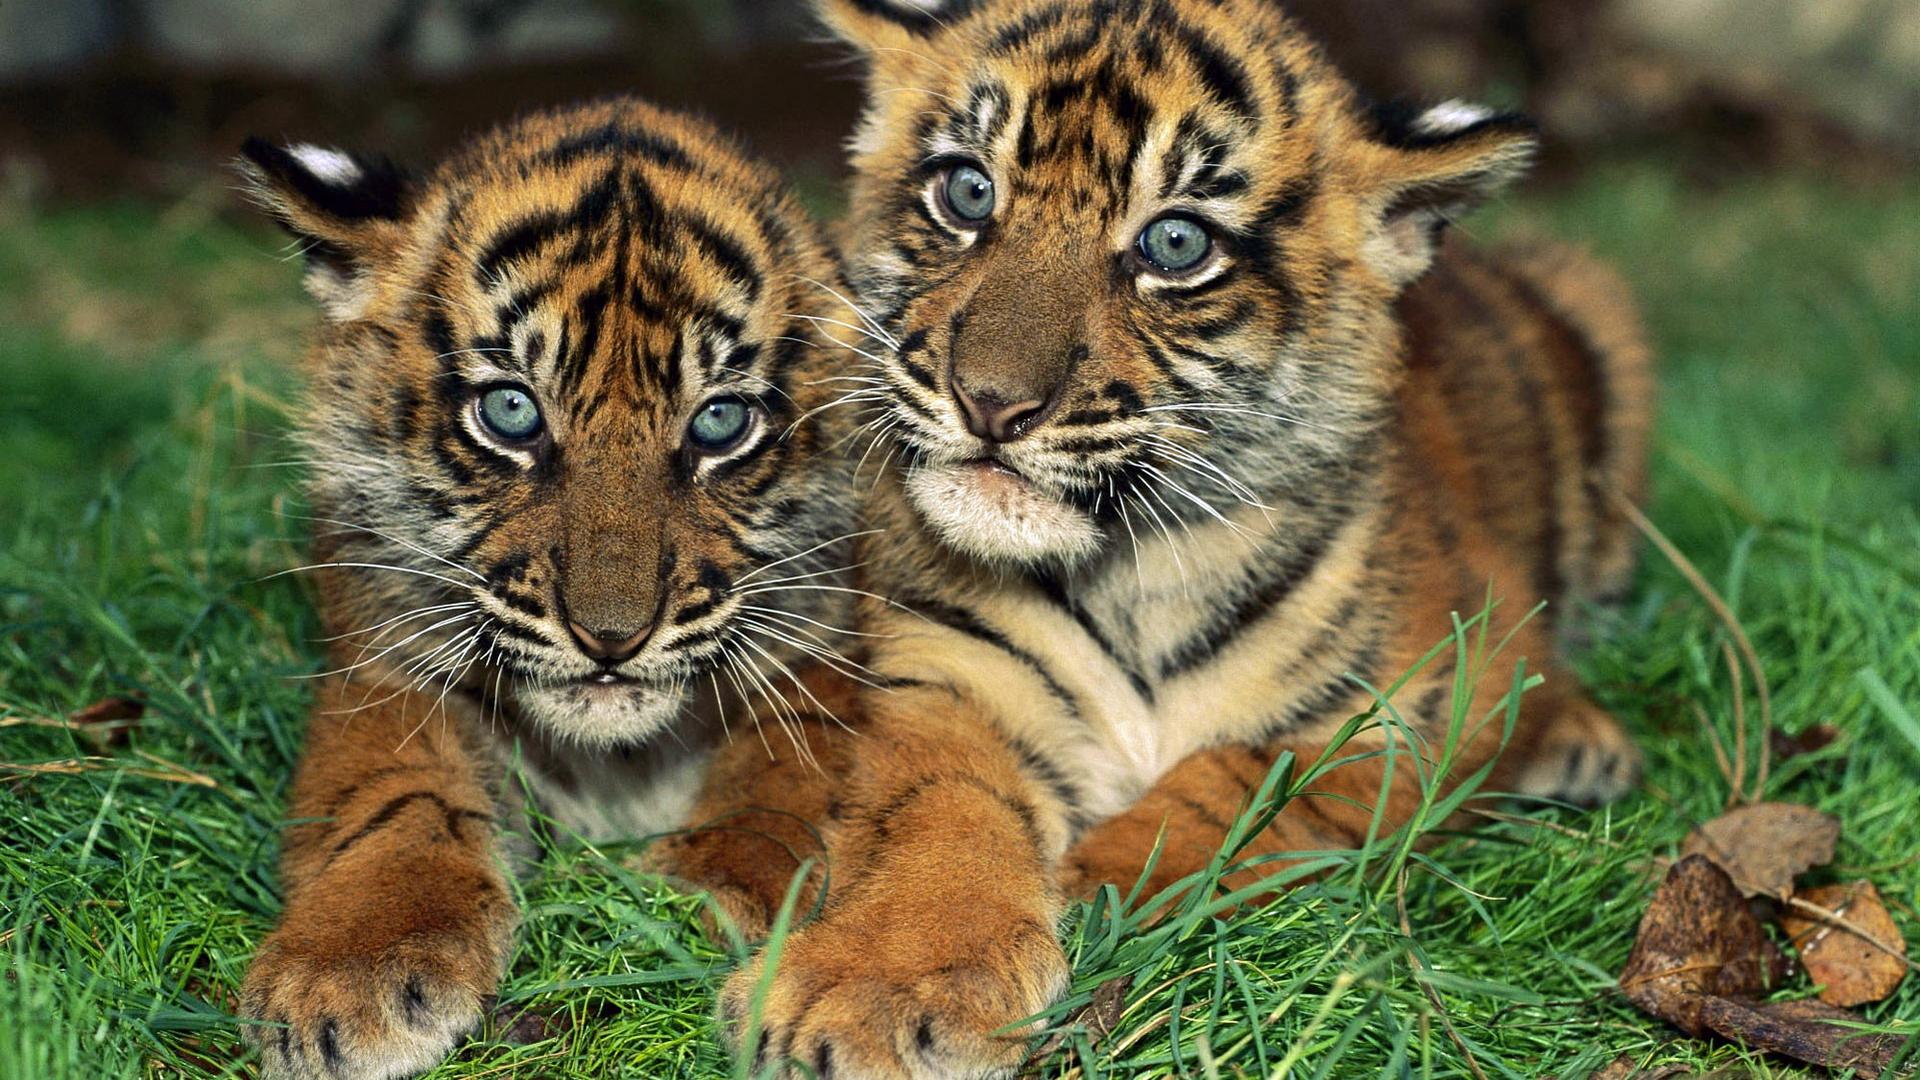 Baby blue tiger